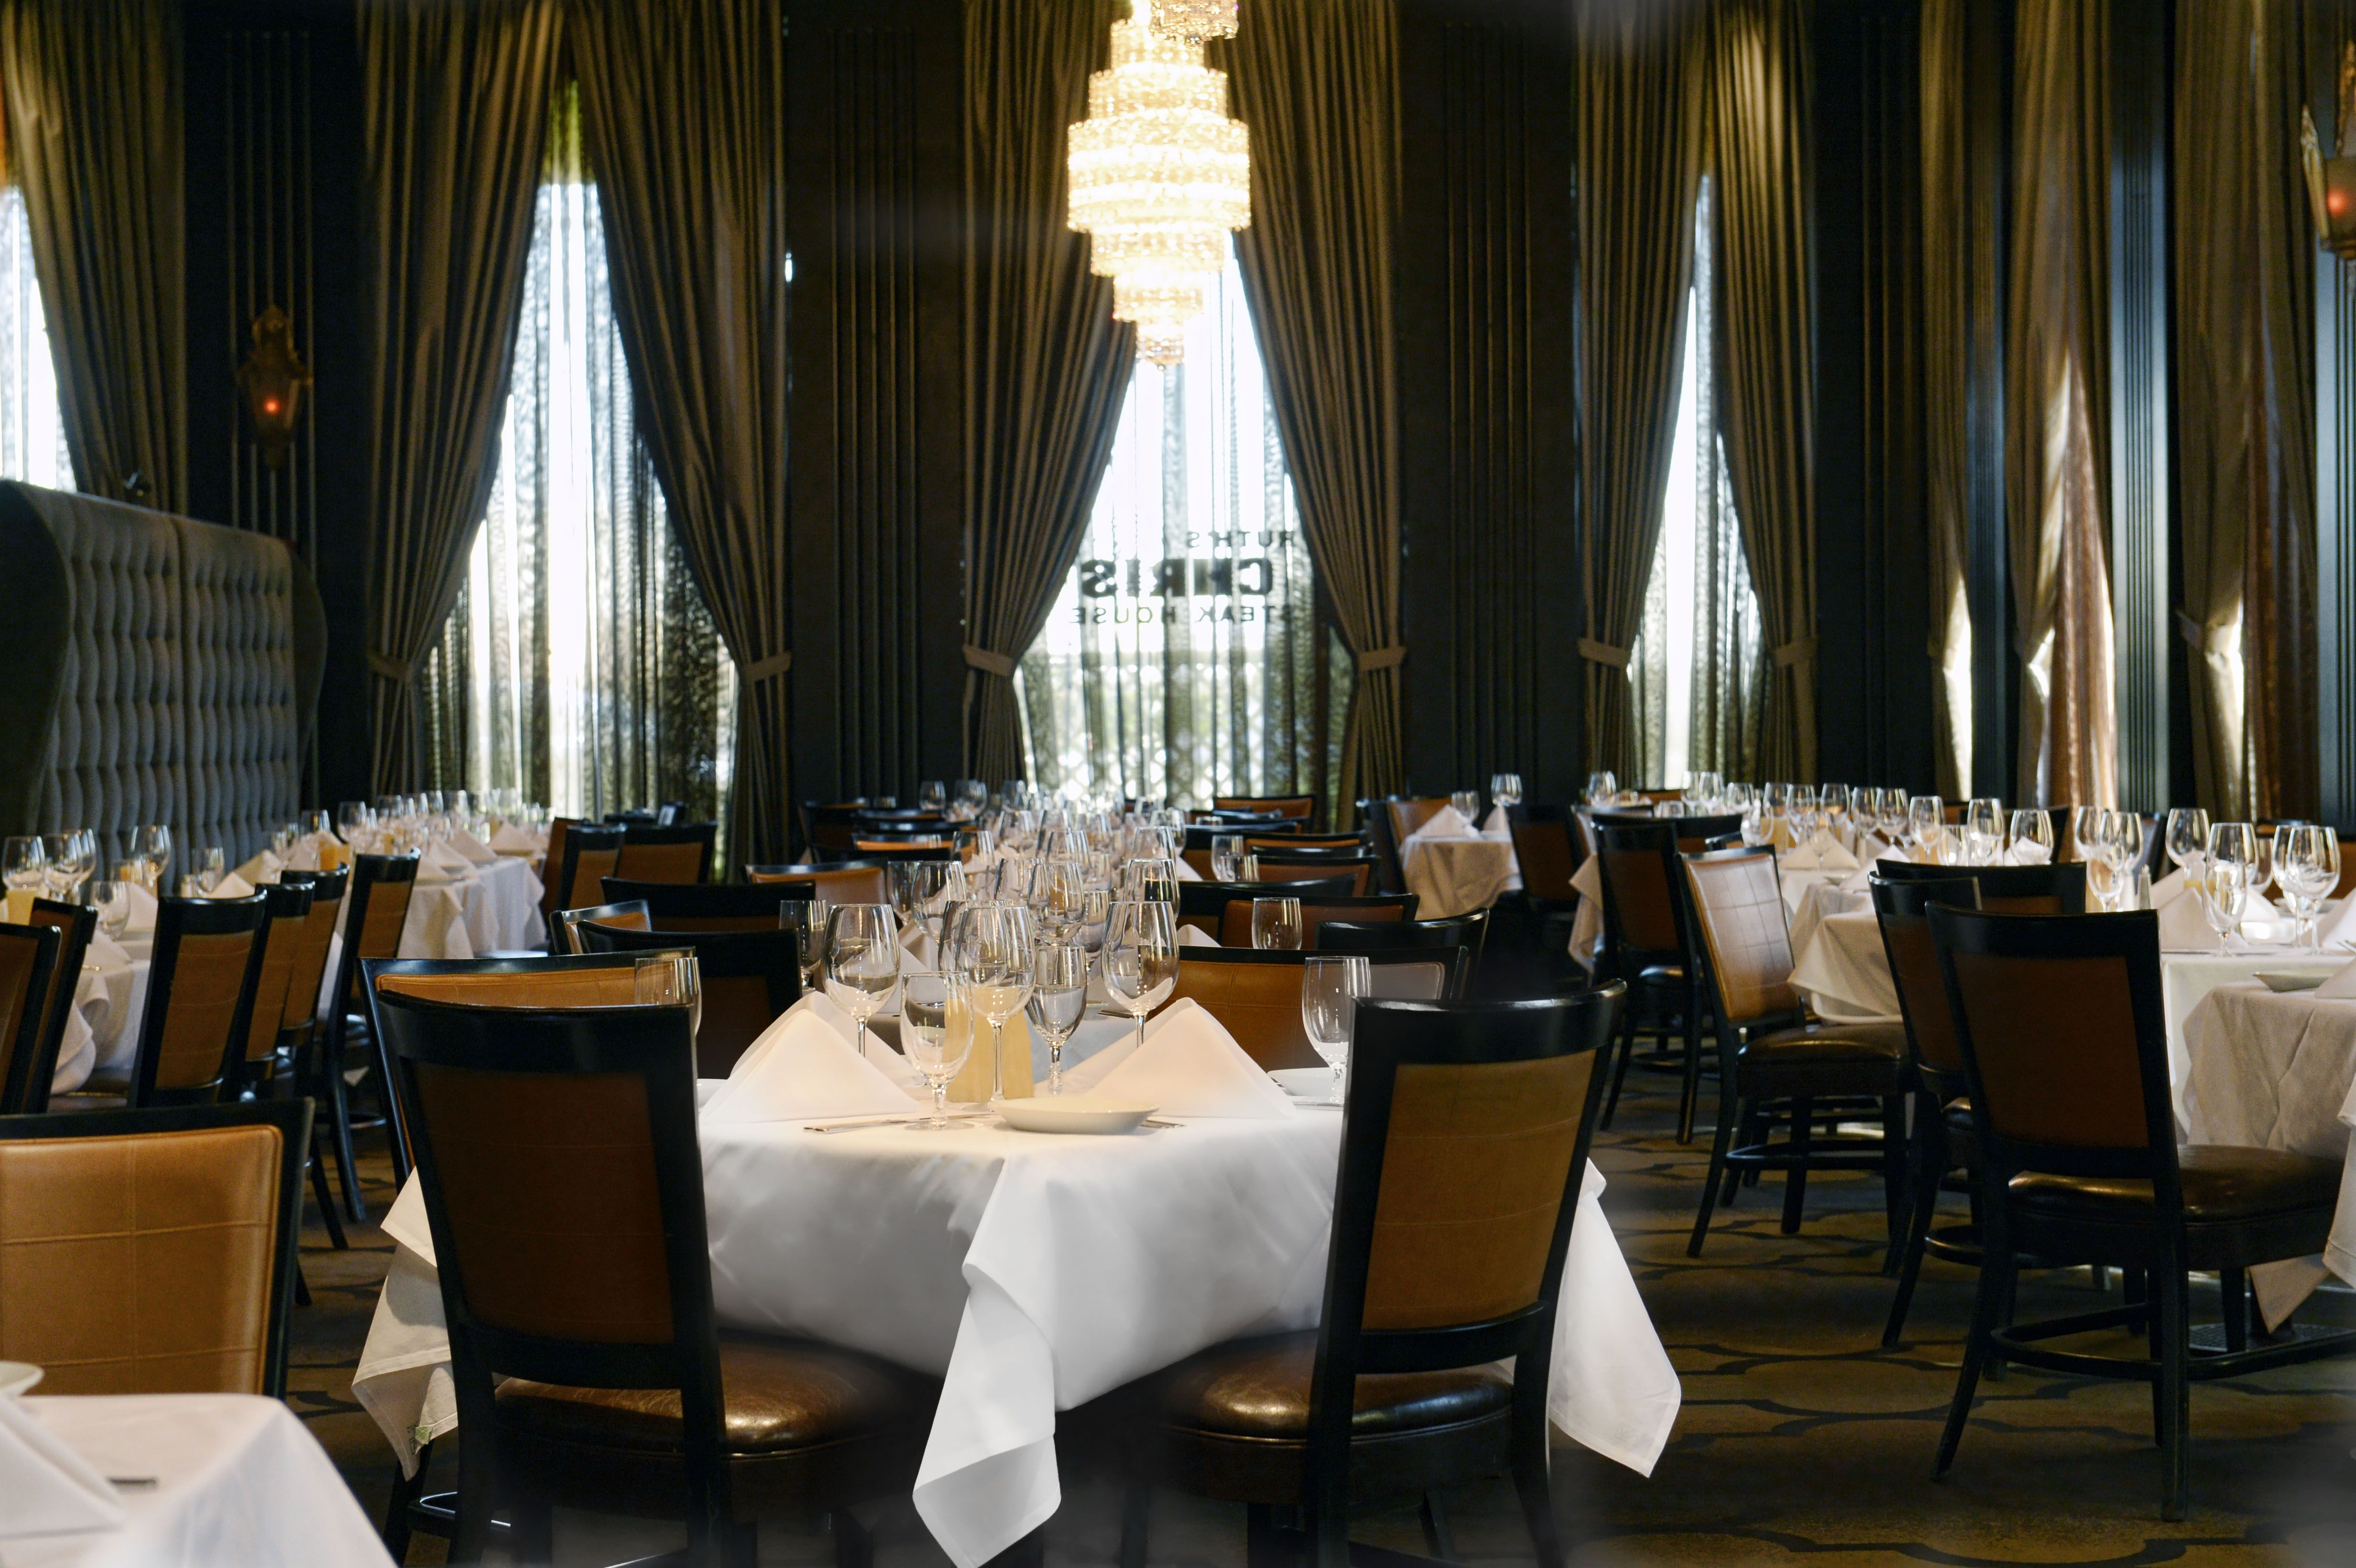 Prime Steak House And Restaurant In Garden City Long Island Ny